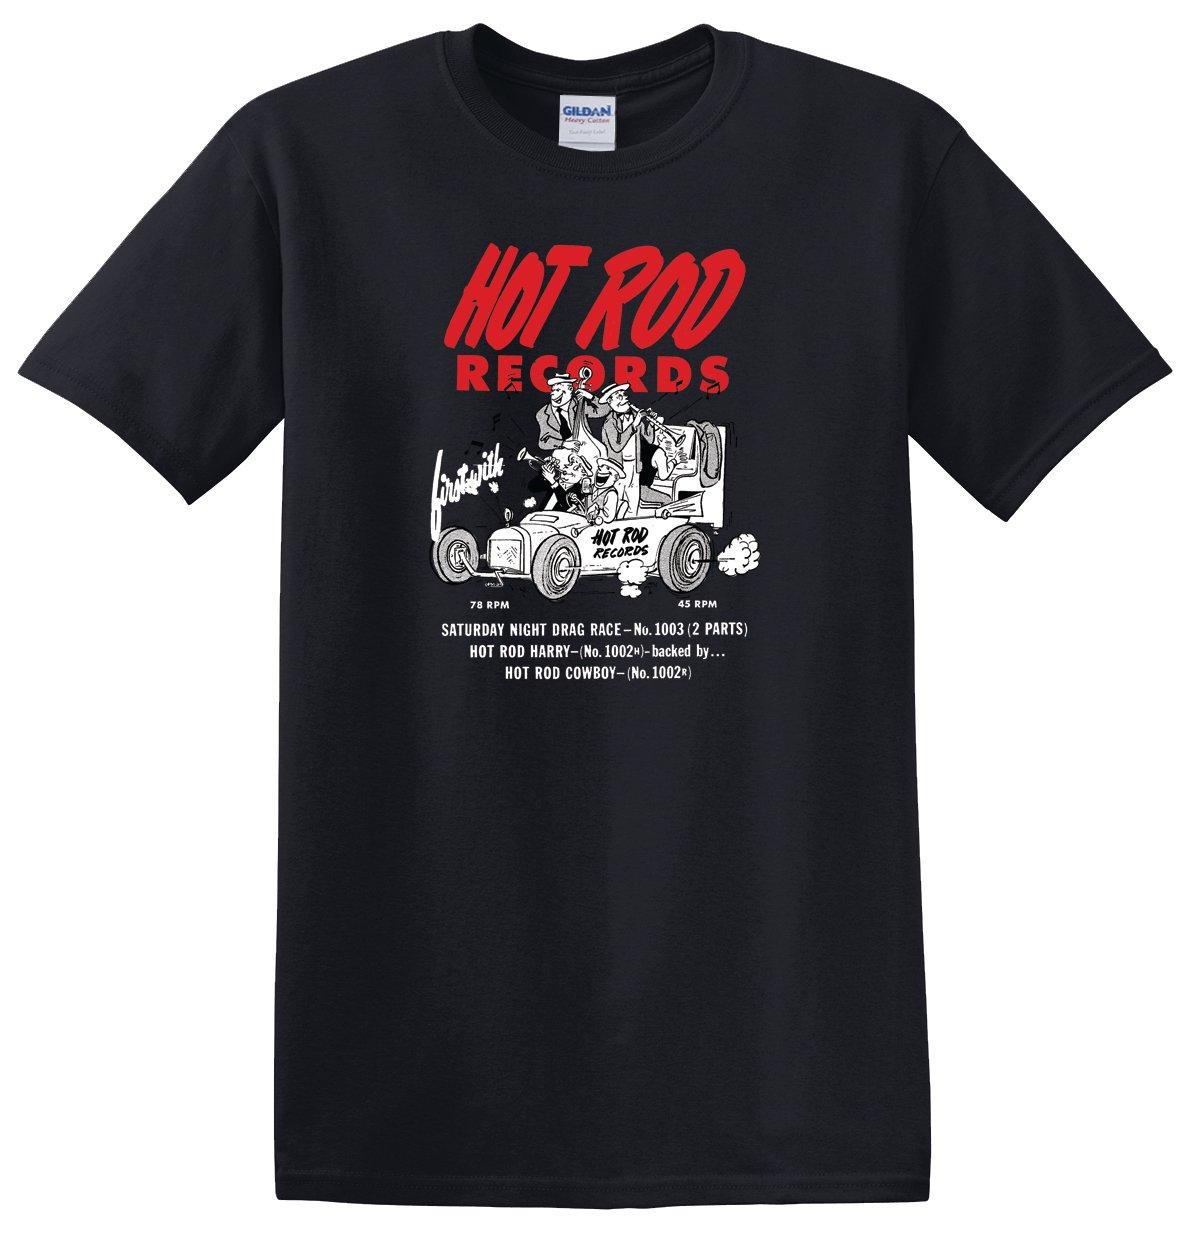 Hot Rod Records T-Shirt